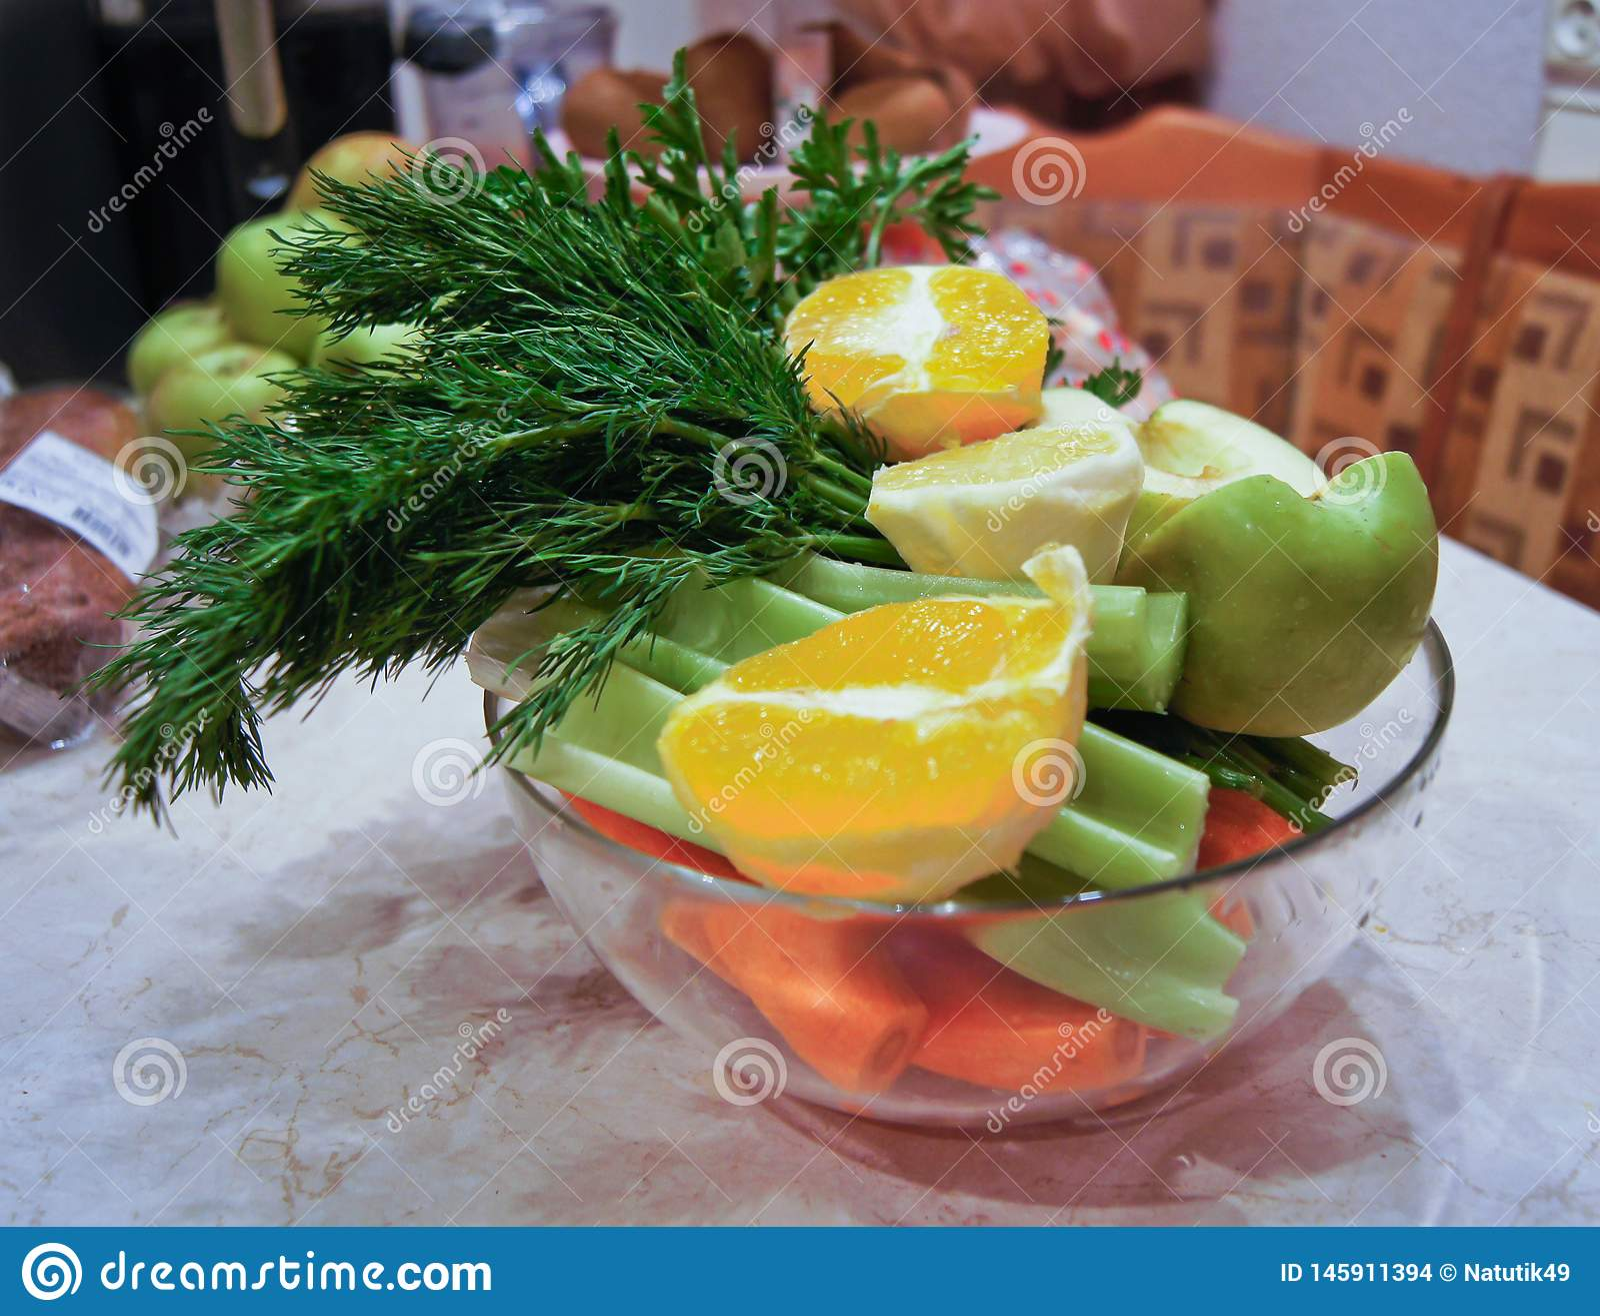 Ingredientes para a salada da dieta, as ma??s e o aipo e cenouras frescas